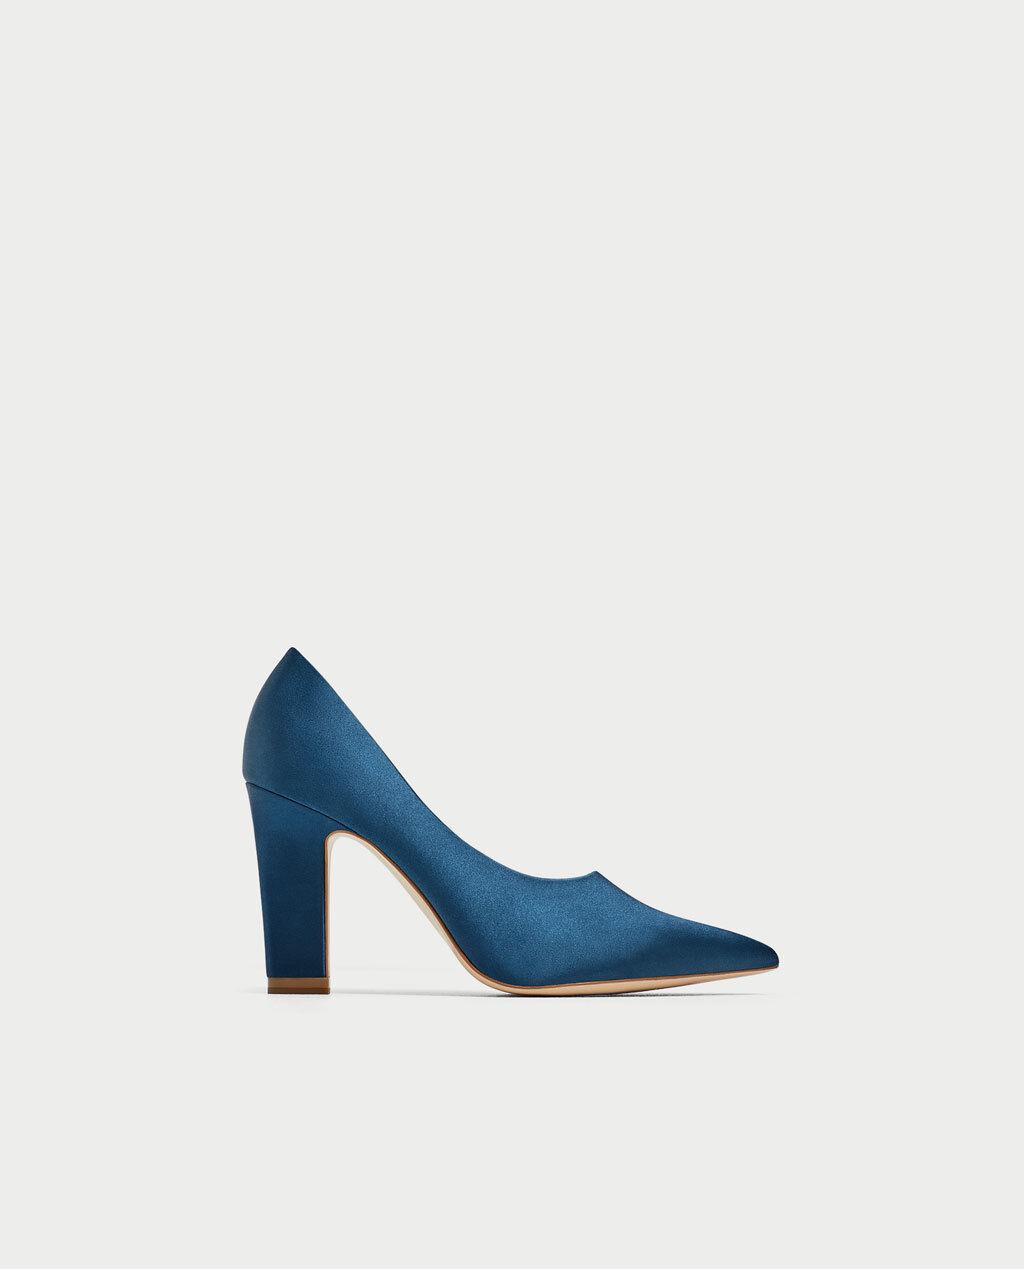 Zara Women Electric bluee Satin high heel court shoes 6218 6218 6218 201 Sz. 7.5 f7e141